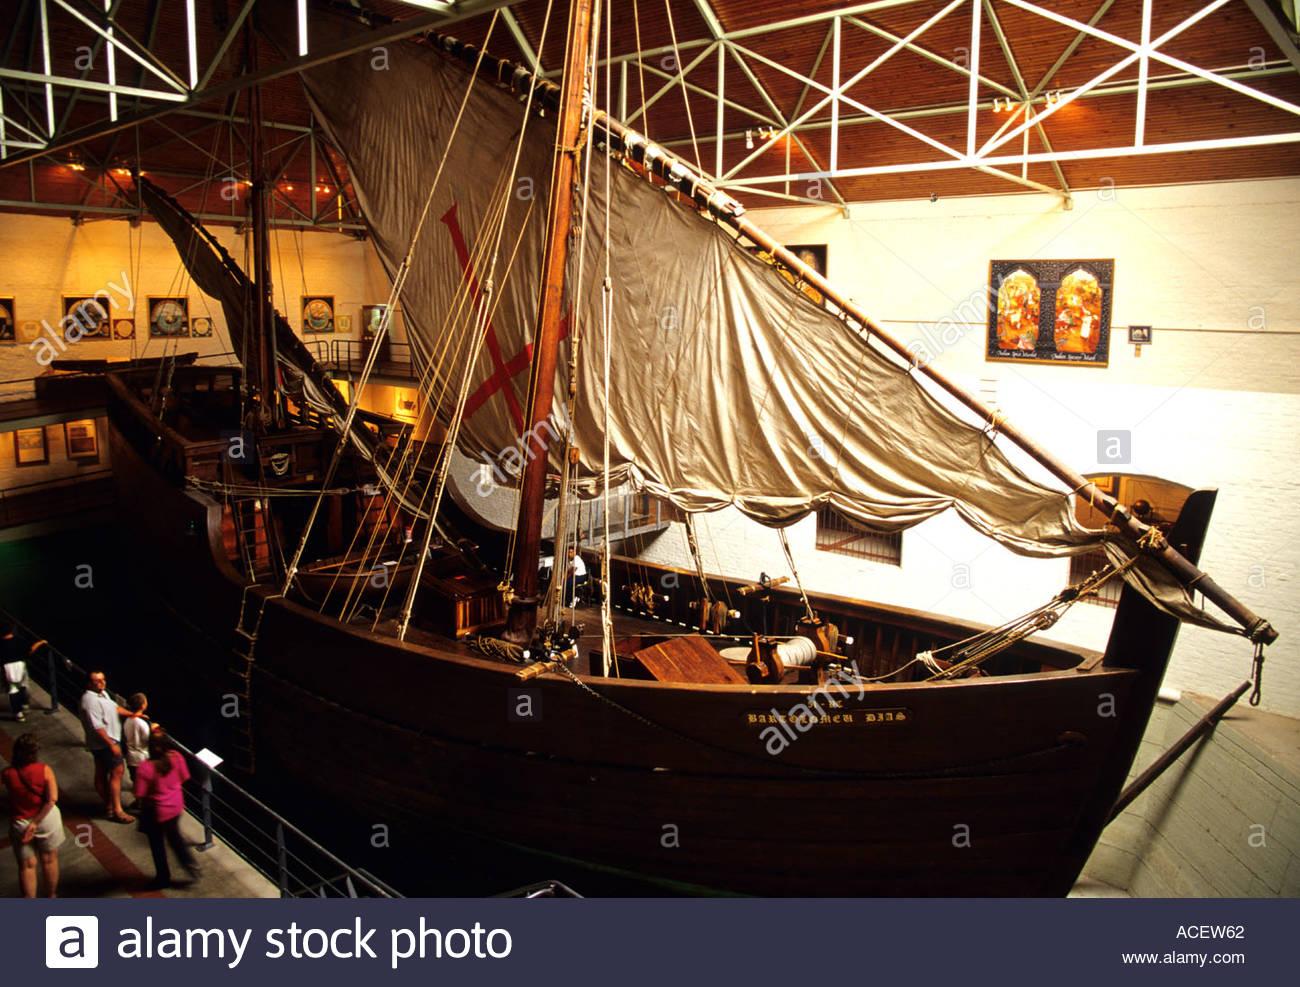 Mossel Bay South Africa Portugese Caravel replica in Bartolomeu Dias Museum - Stock Image